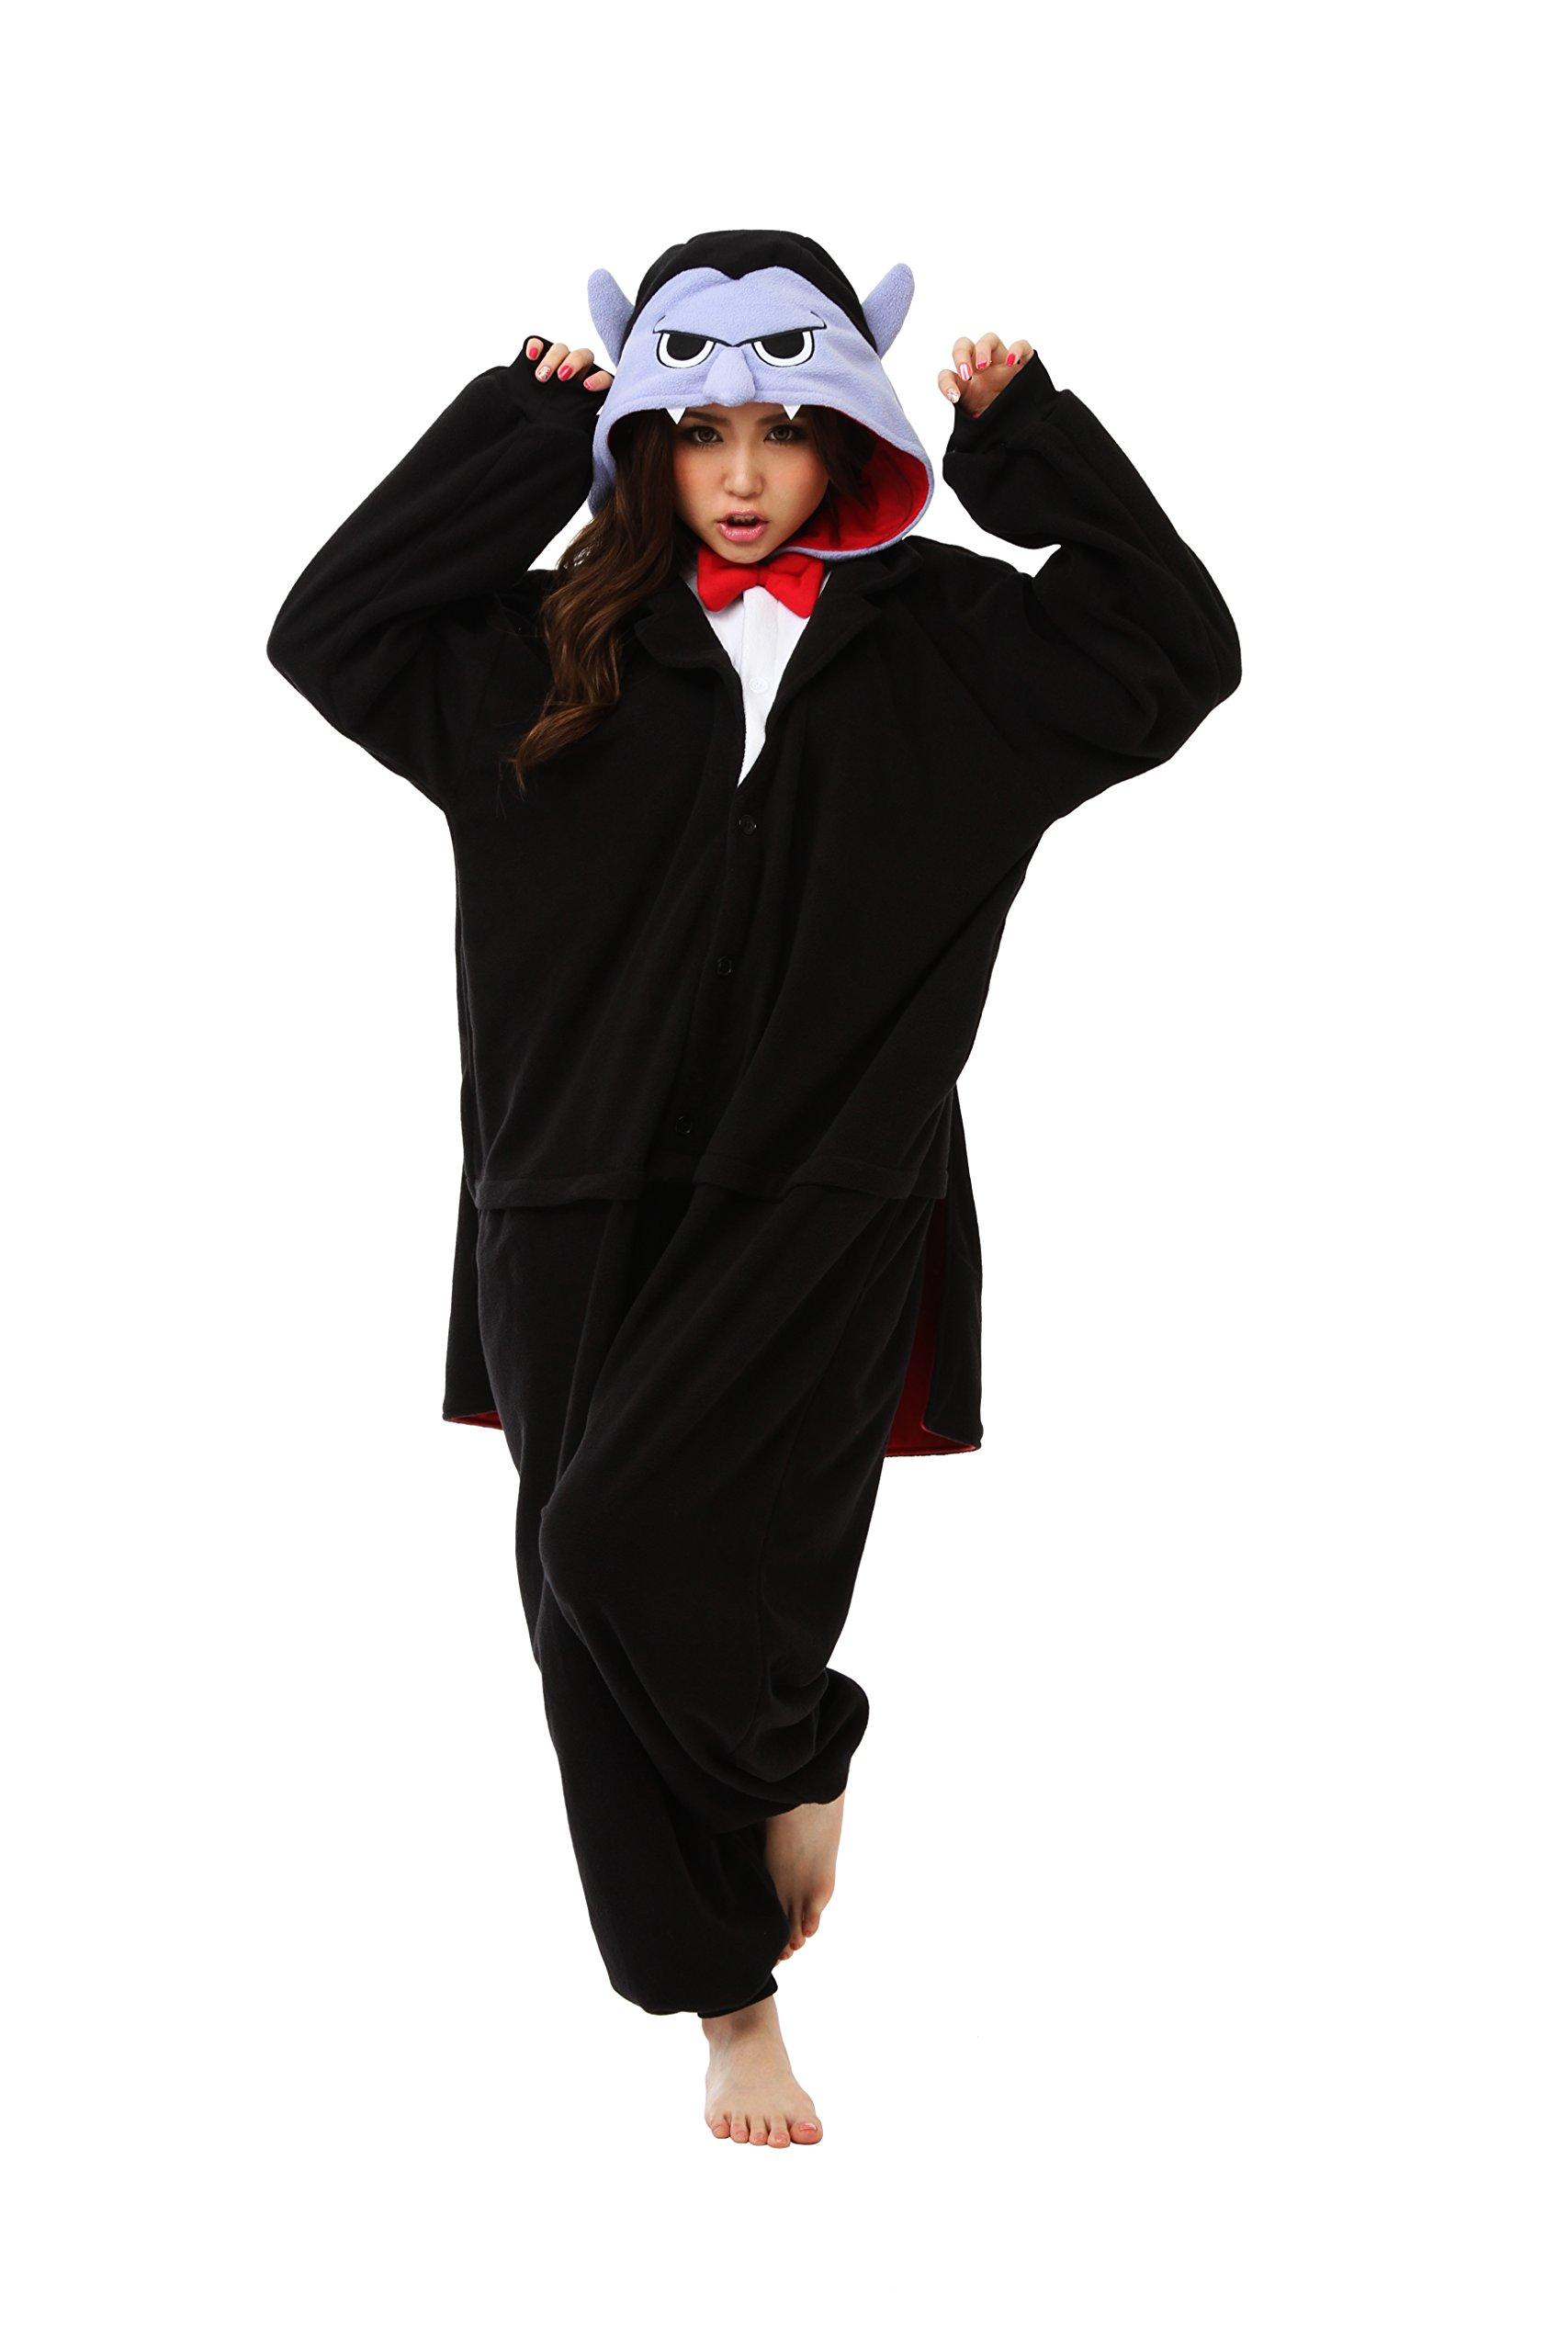 Vampire Kigurumi - Adult Costume (a.k.a Dracula)